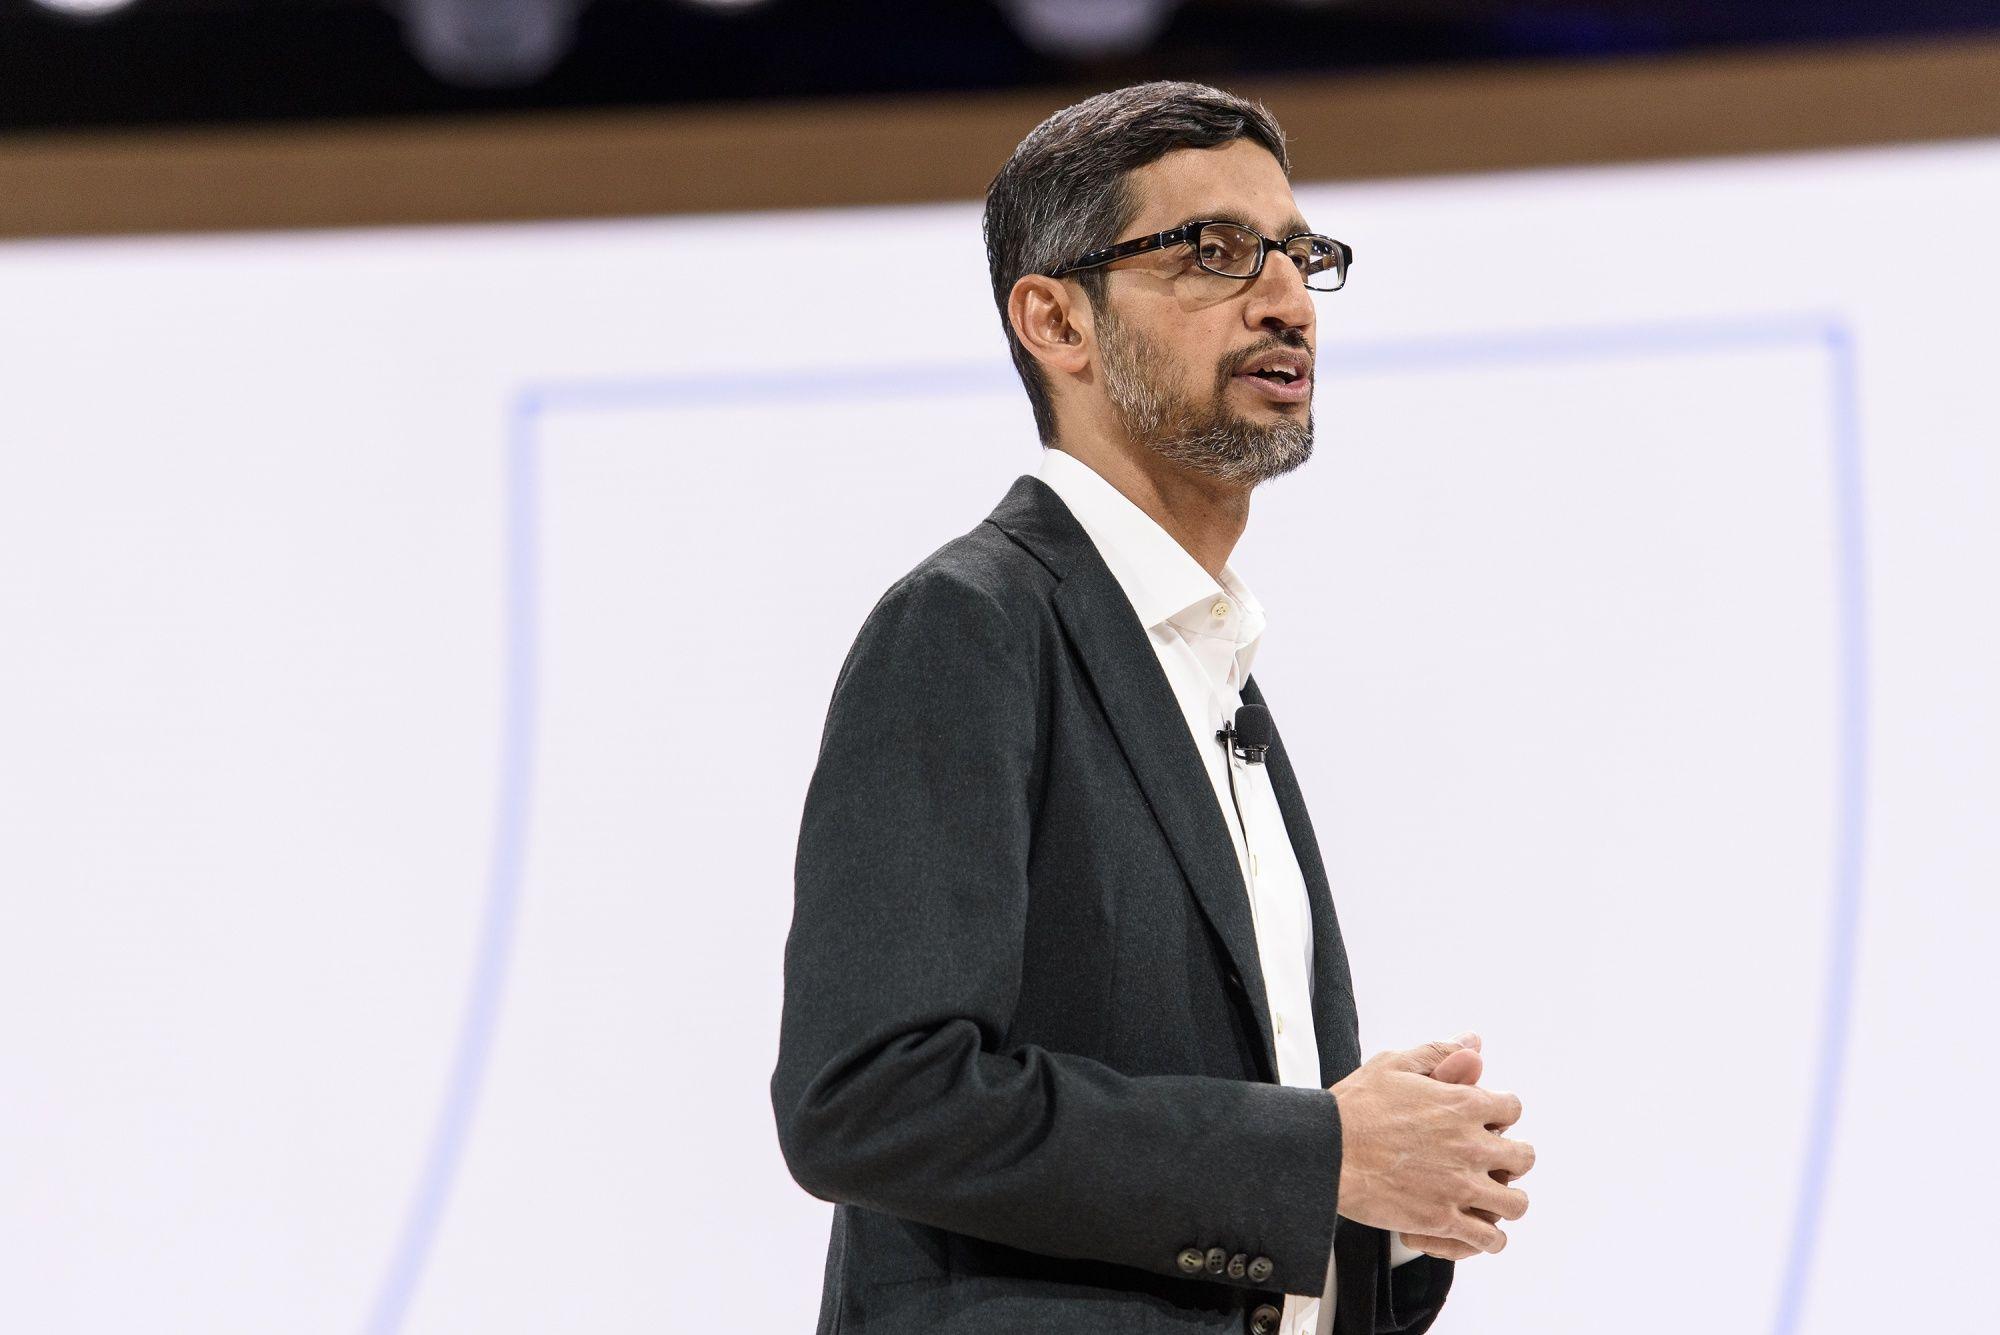 Google Founders Give Up on Being the Warren Buffett of Tech